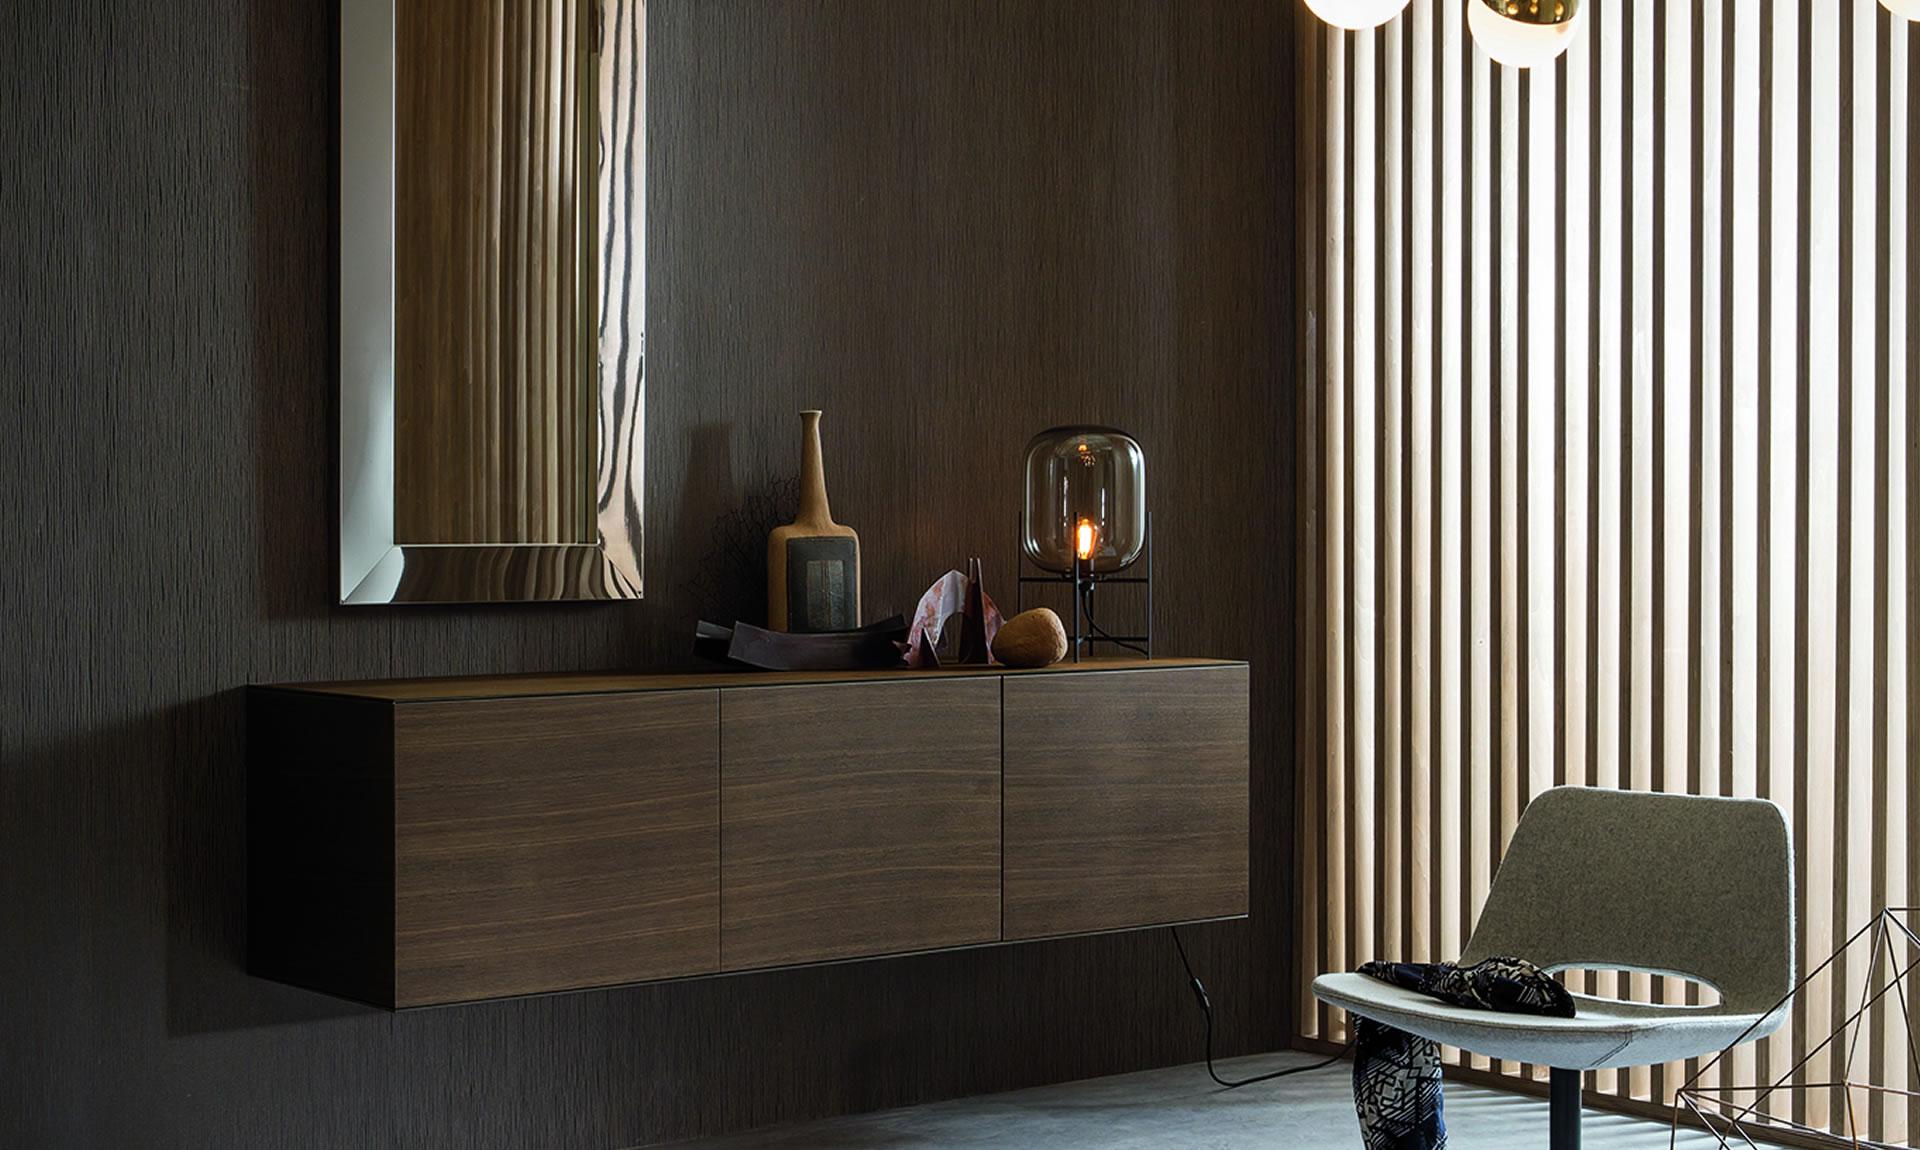 Buffet haut de gamme commode design for Meuble contemporain italien haut de gamme